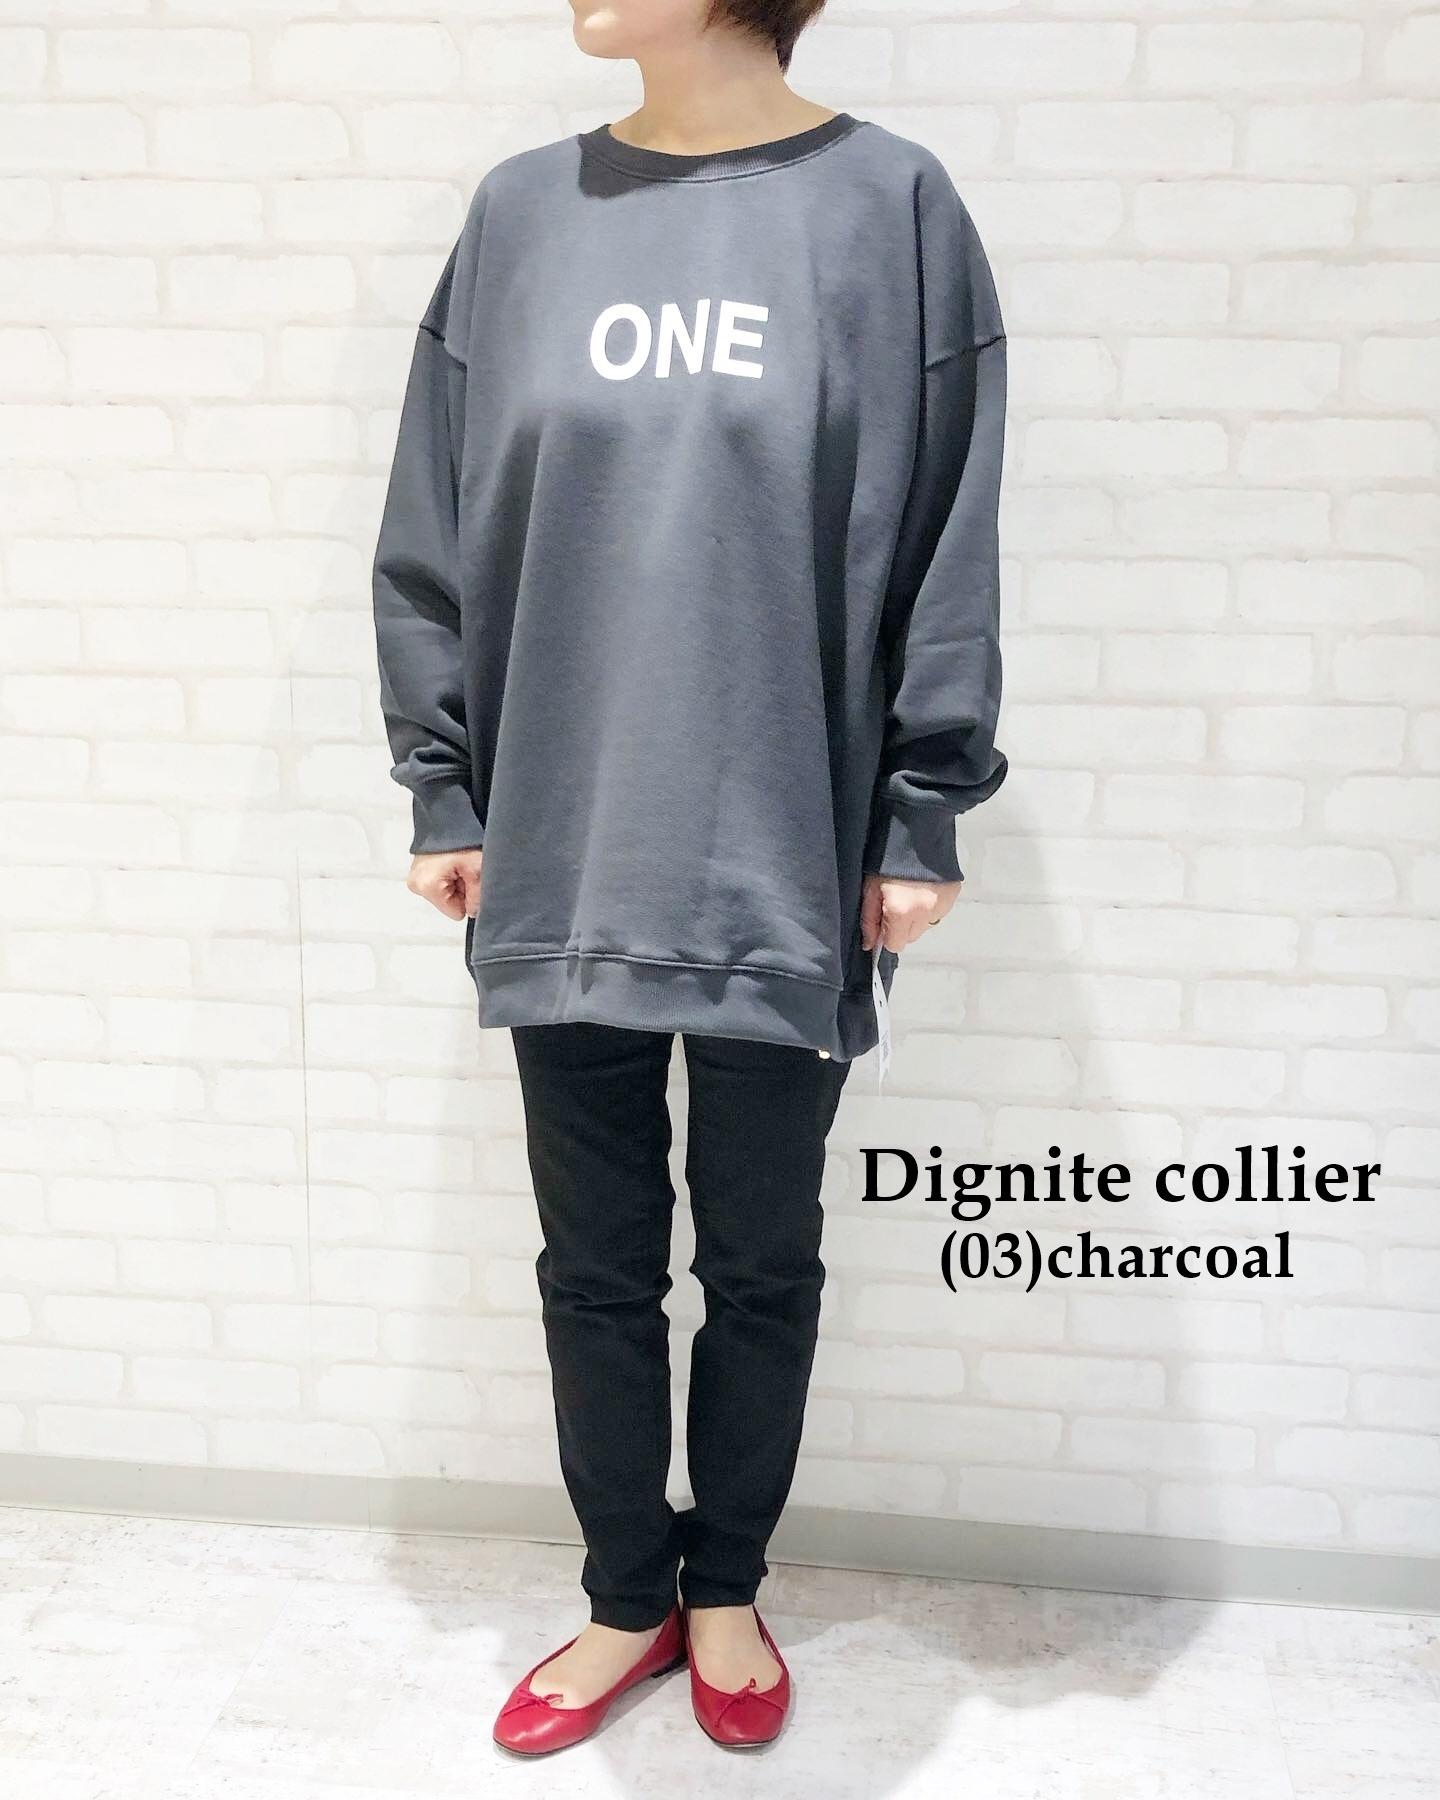 Dignite Collier/KAT-801004